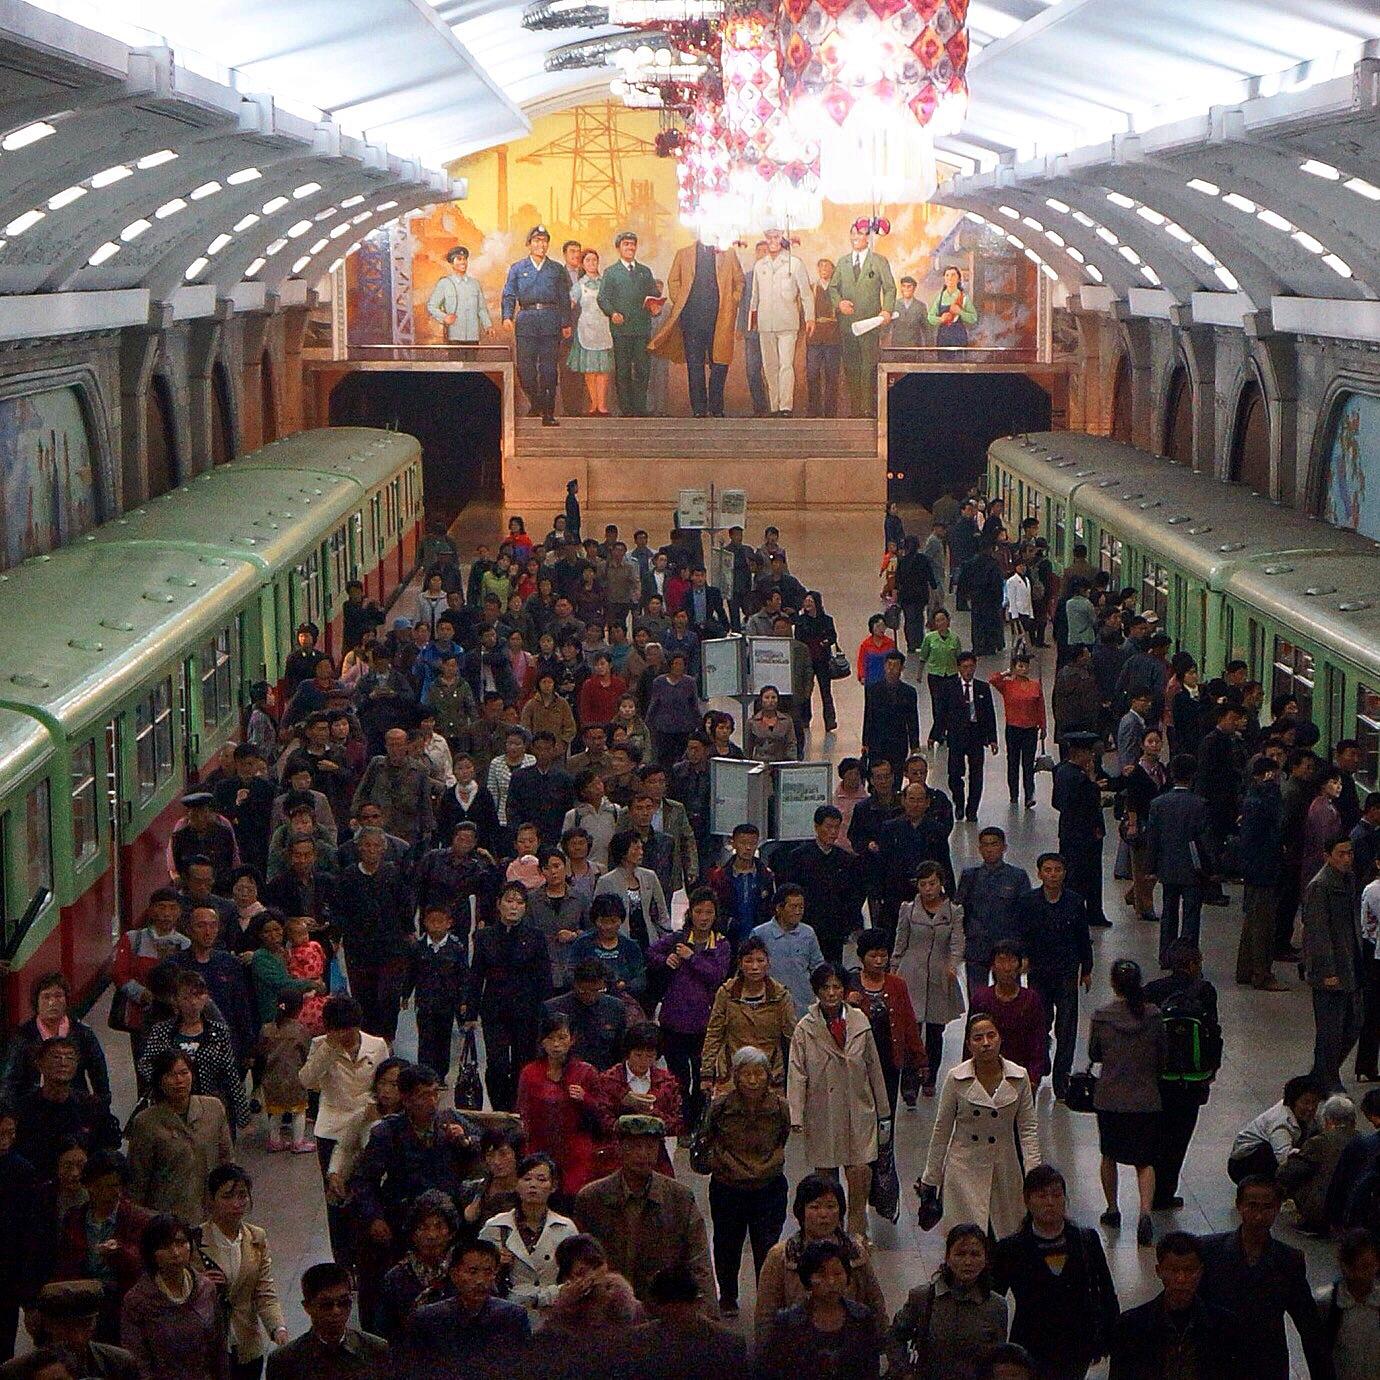 Rush hour at Prosperity (Puheung) Station -- Pyongyang Metro.